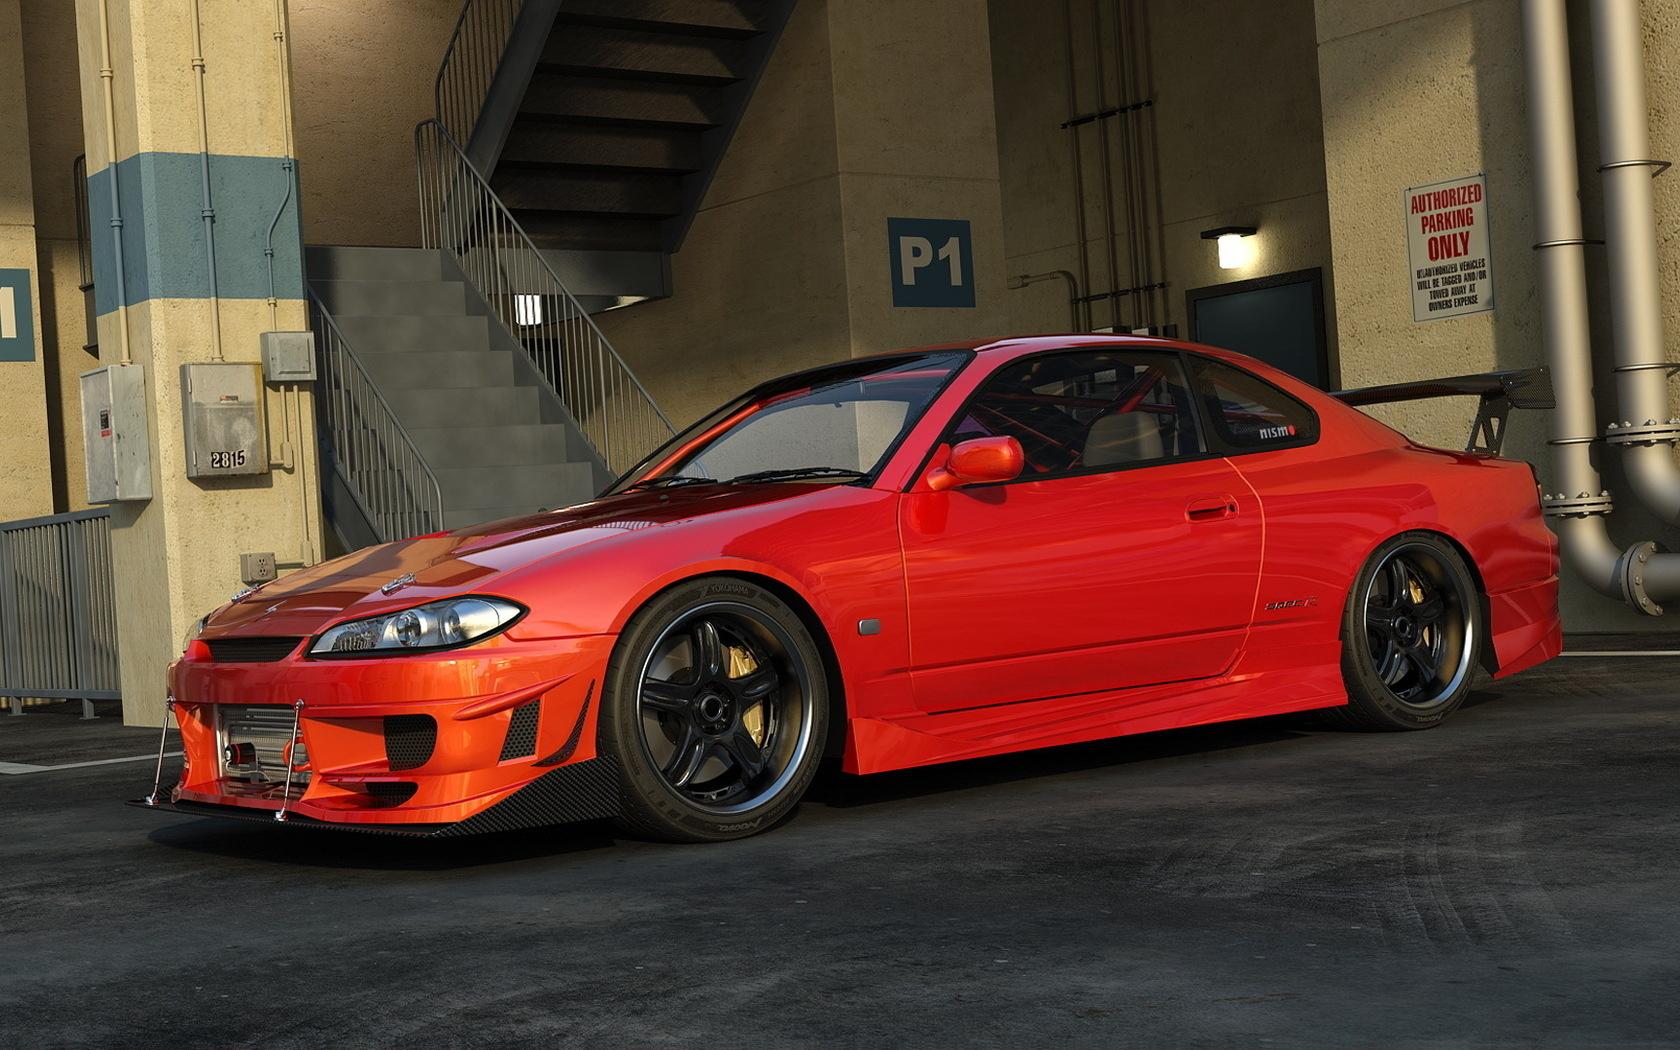 Red Nissan Silvia Wallpaper